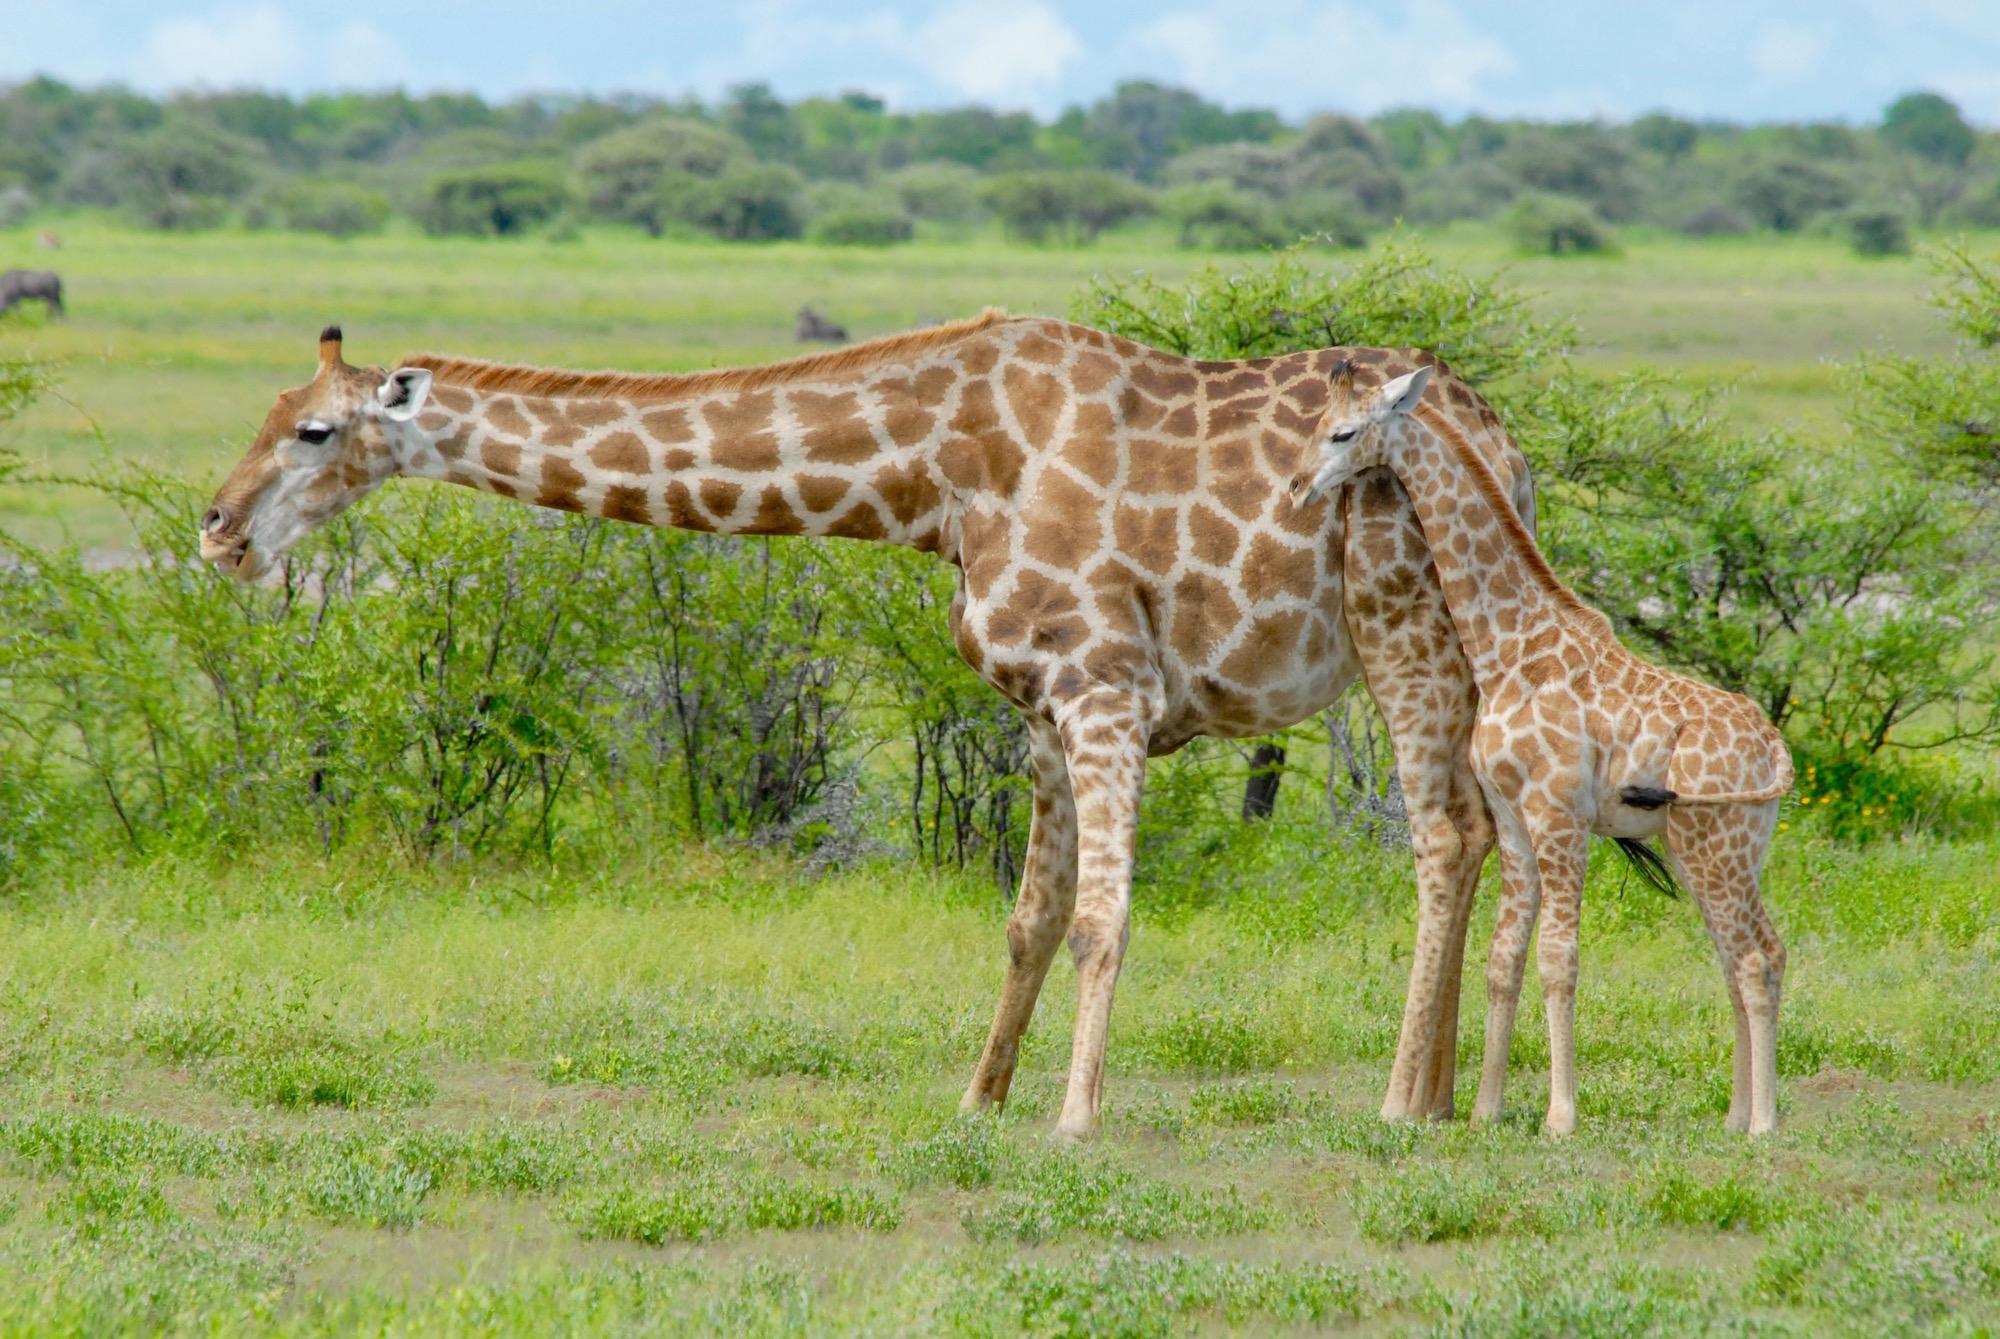 Mommy Giraffe and baby